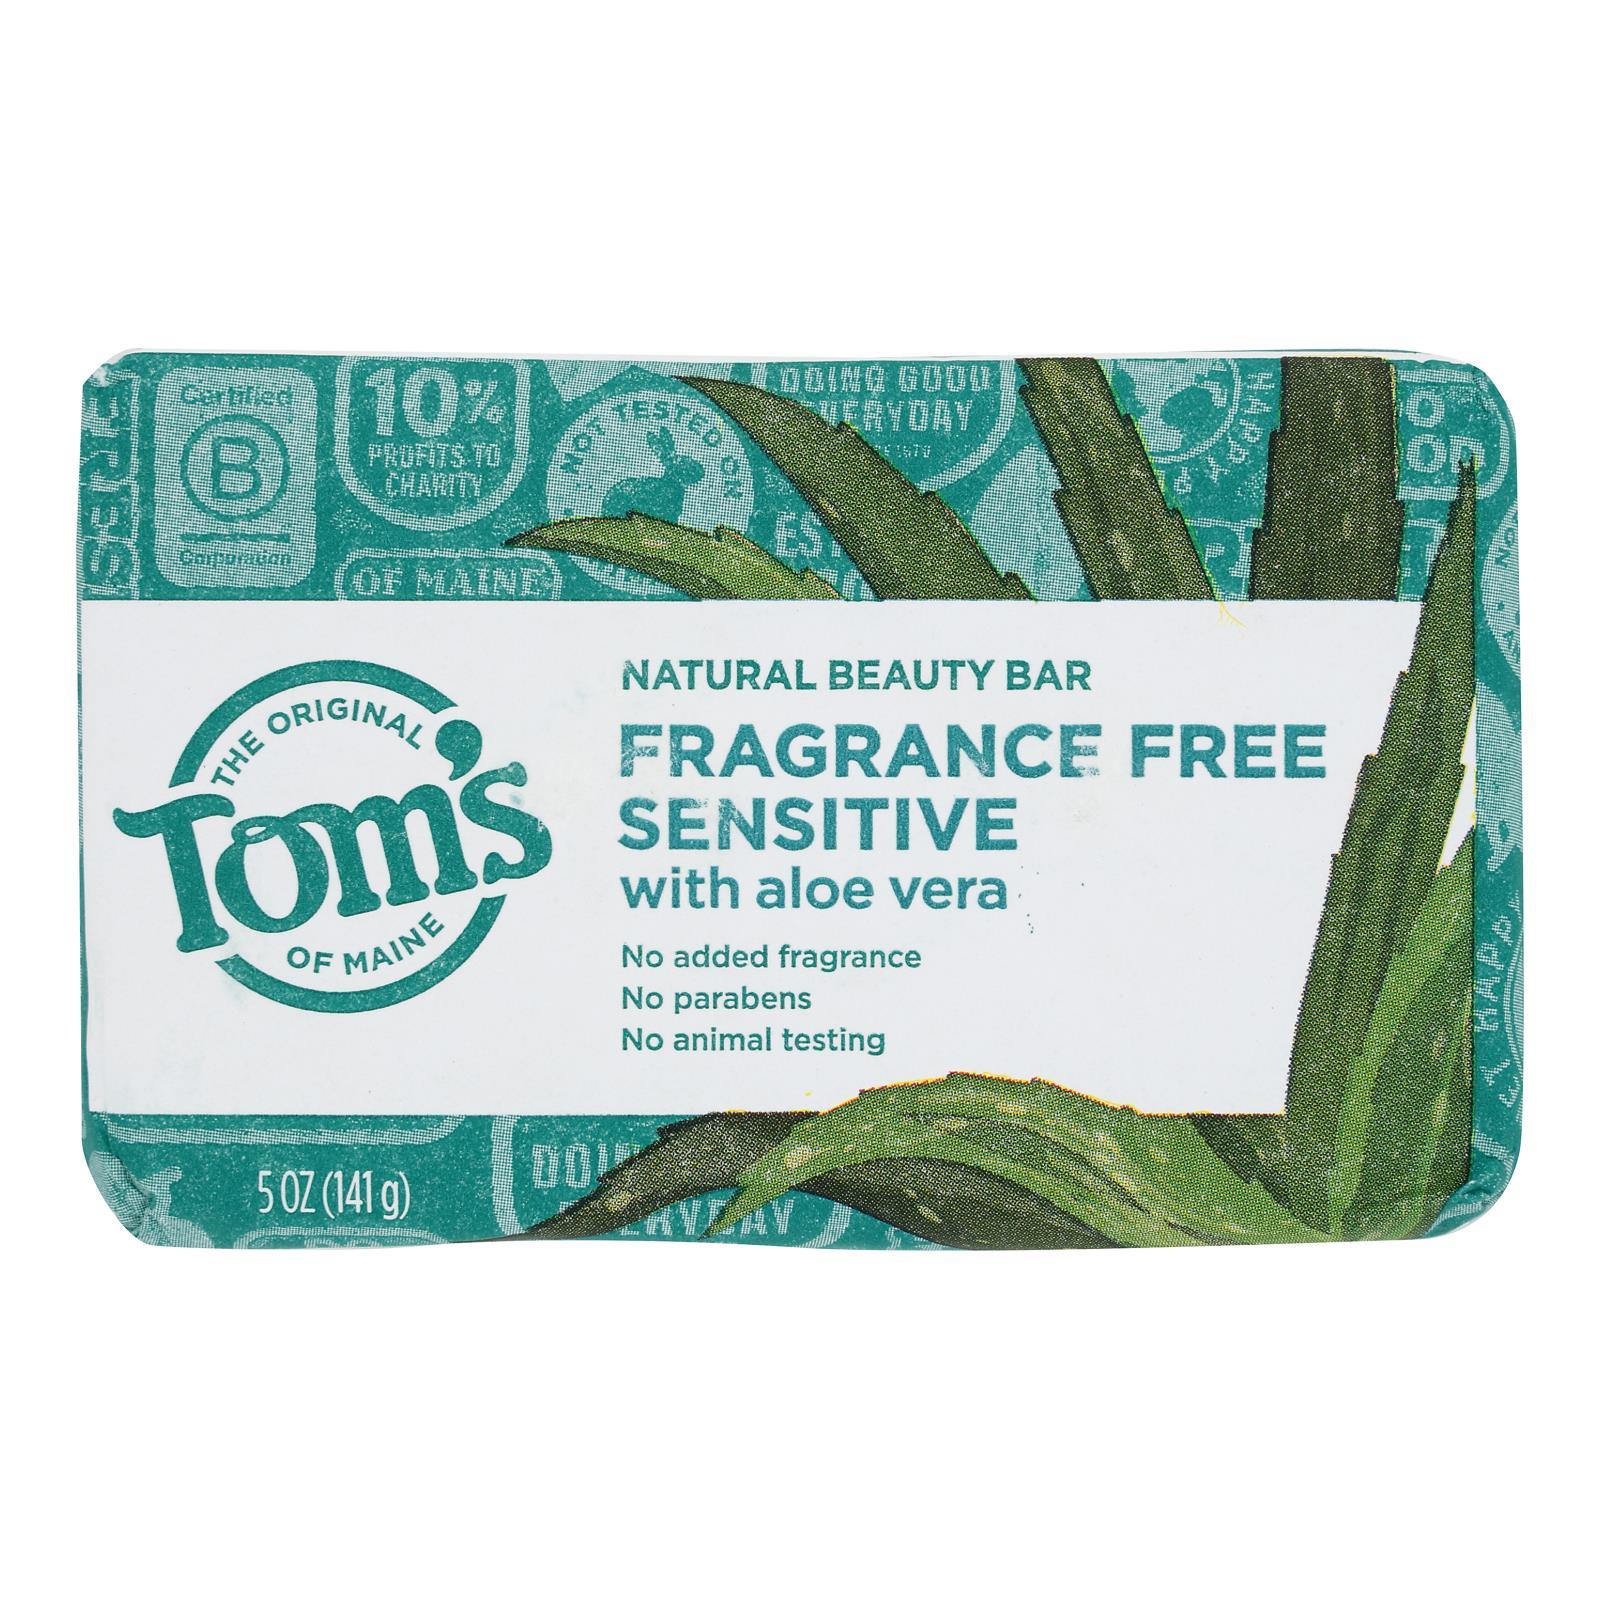 Tom's Of Maine - Beauty Bar Sensitive Fat Free - Case of 6 - 5 OZ